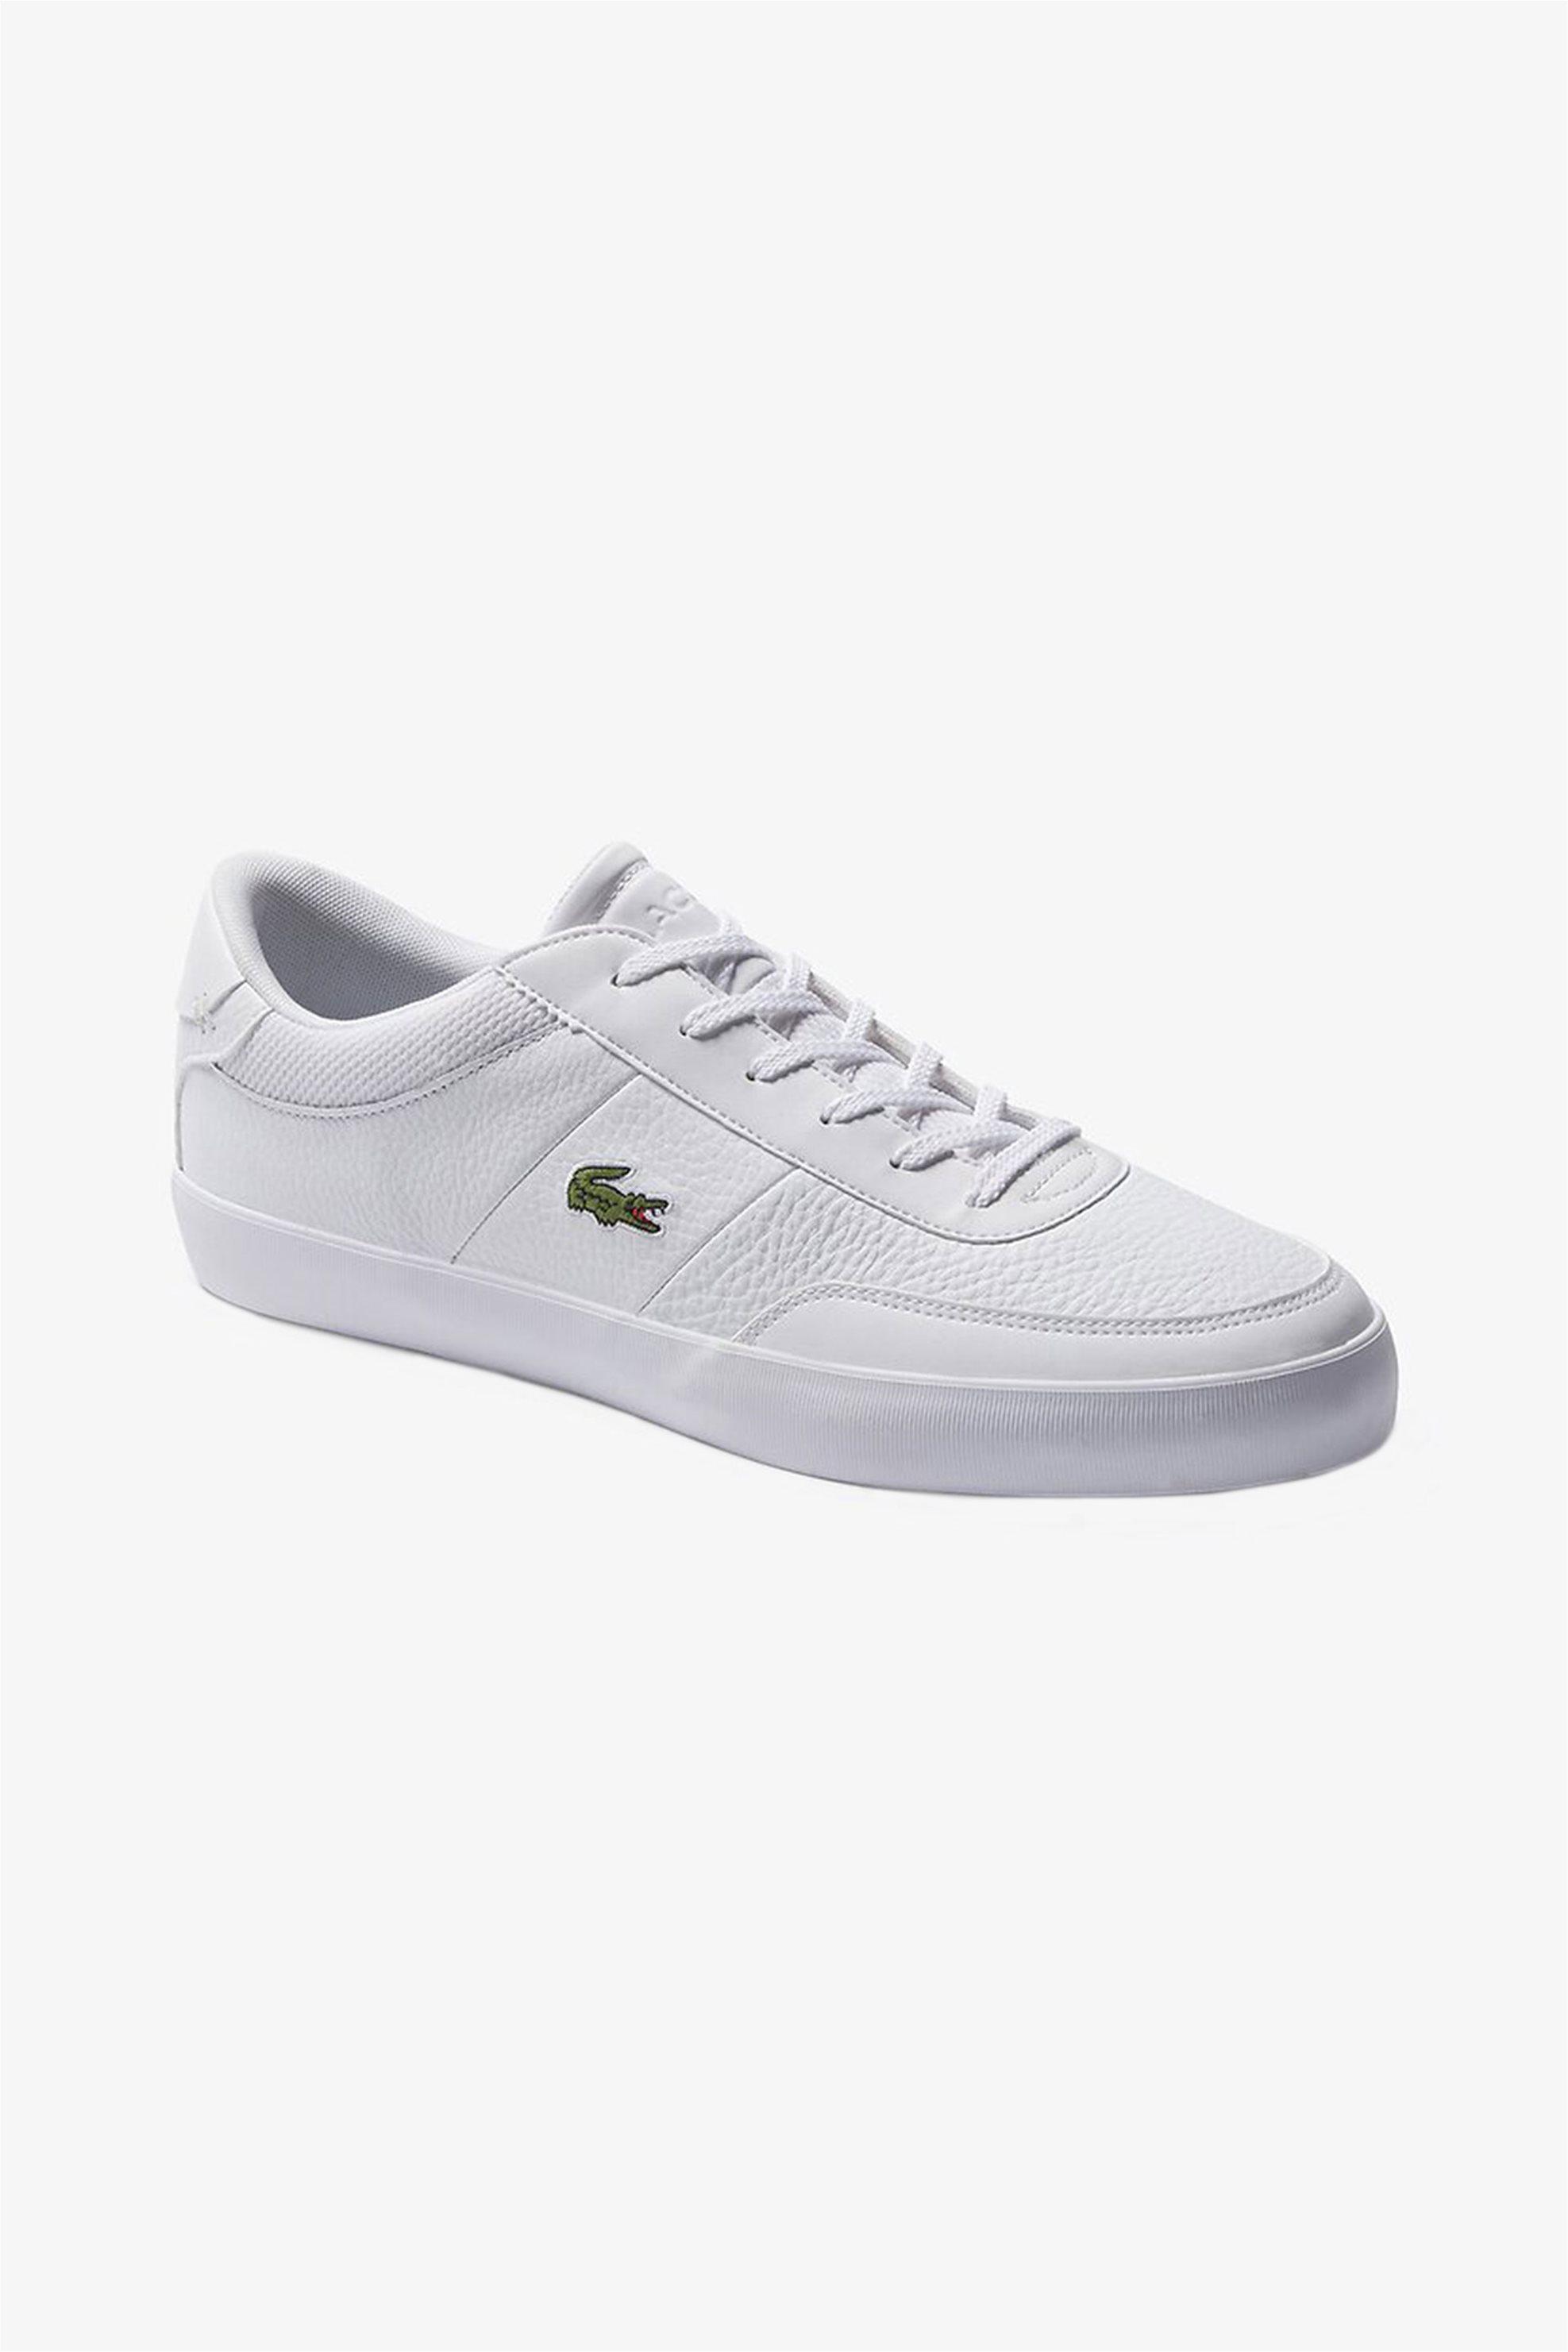 "Lacoste ανδρικά sneakers ""Court Master"" – 39CMA007121G – Λευκό"